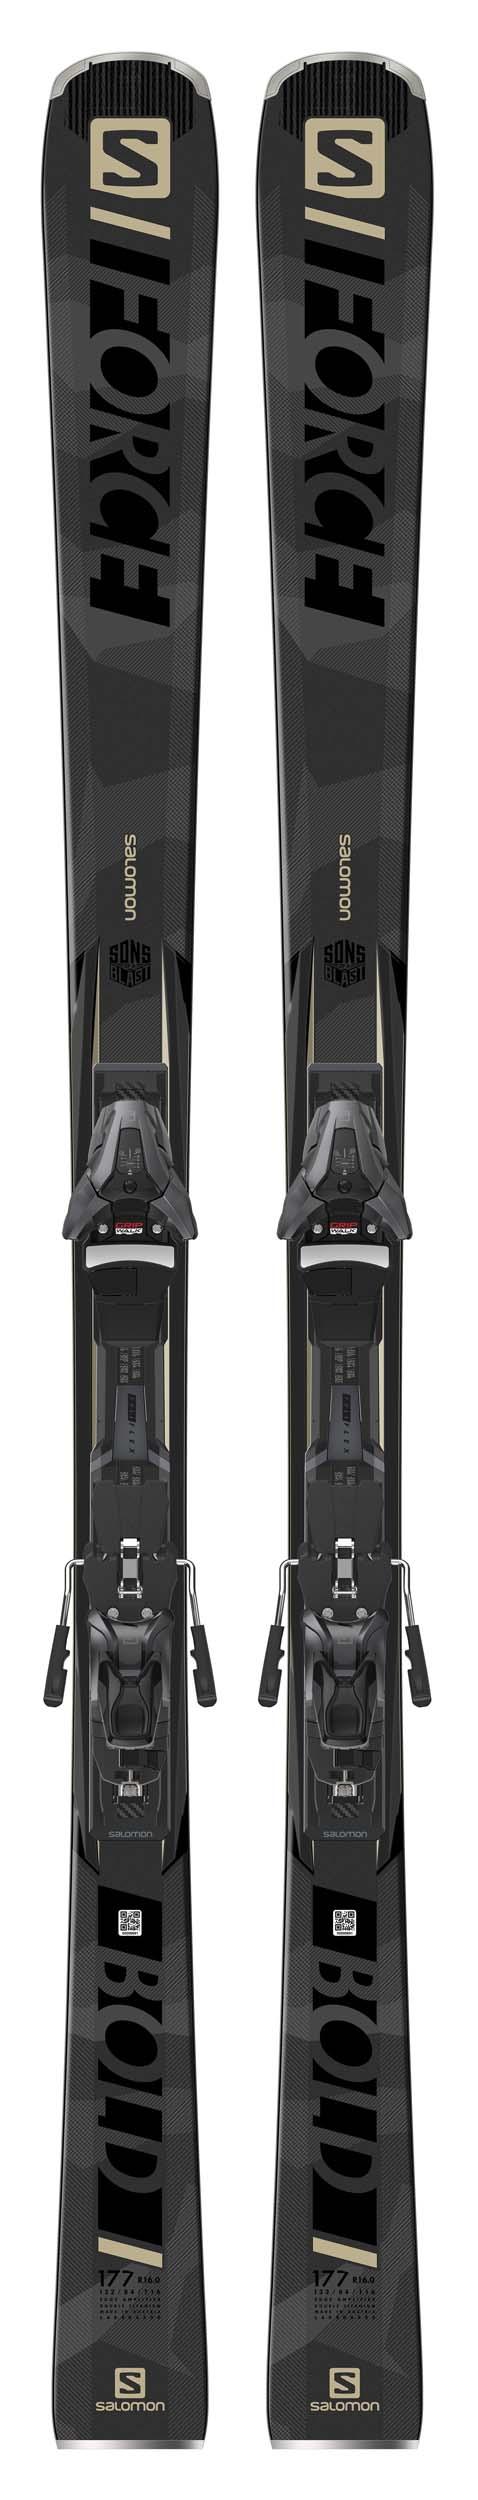 Salomon 2021 S/Force Bold Skis wZ12 GW Bindings NEW !! 170,177,184cm